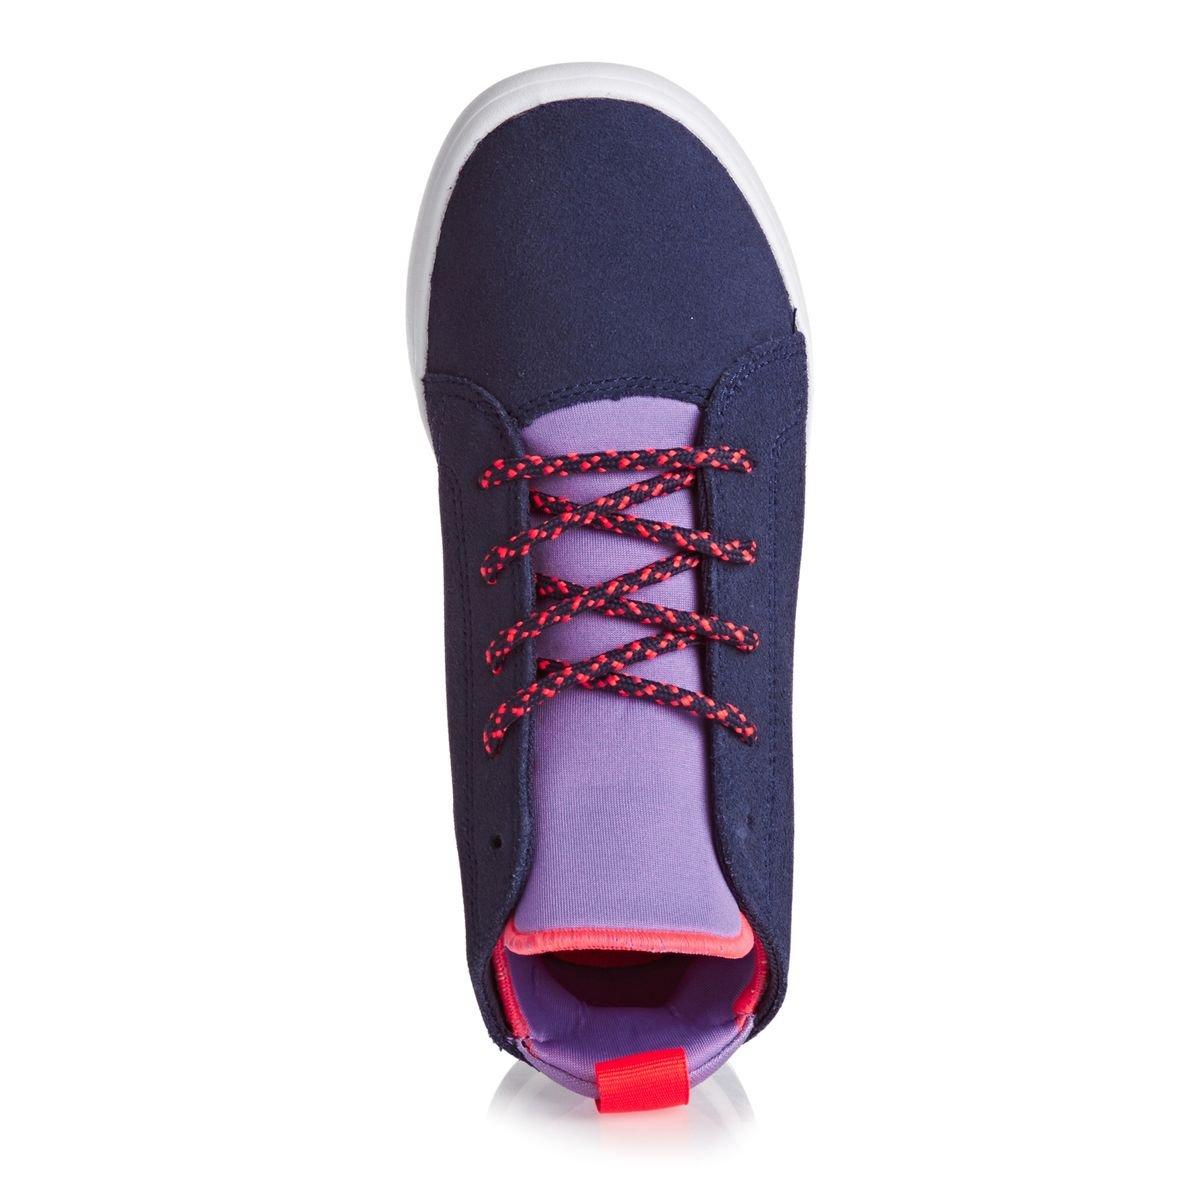 a442a0d9098e Converse Junior CTAS Easy Ride Mid 654296C Sneakers  Amazon.co.uk  Clothing